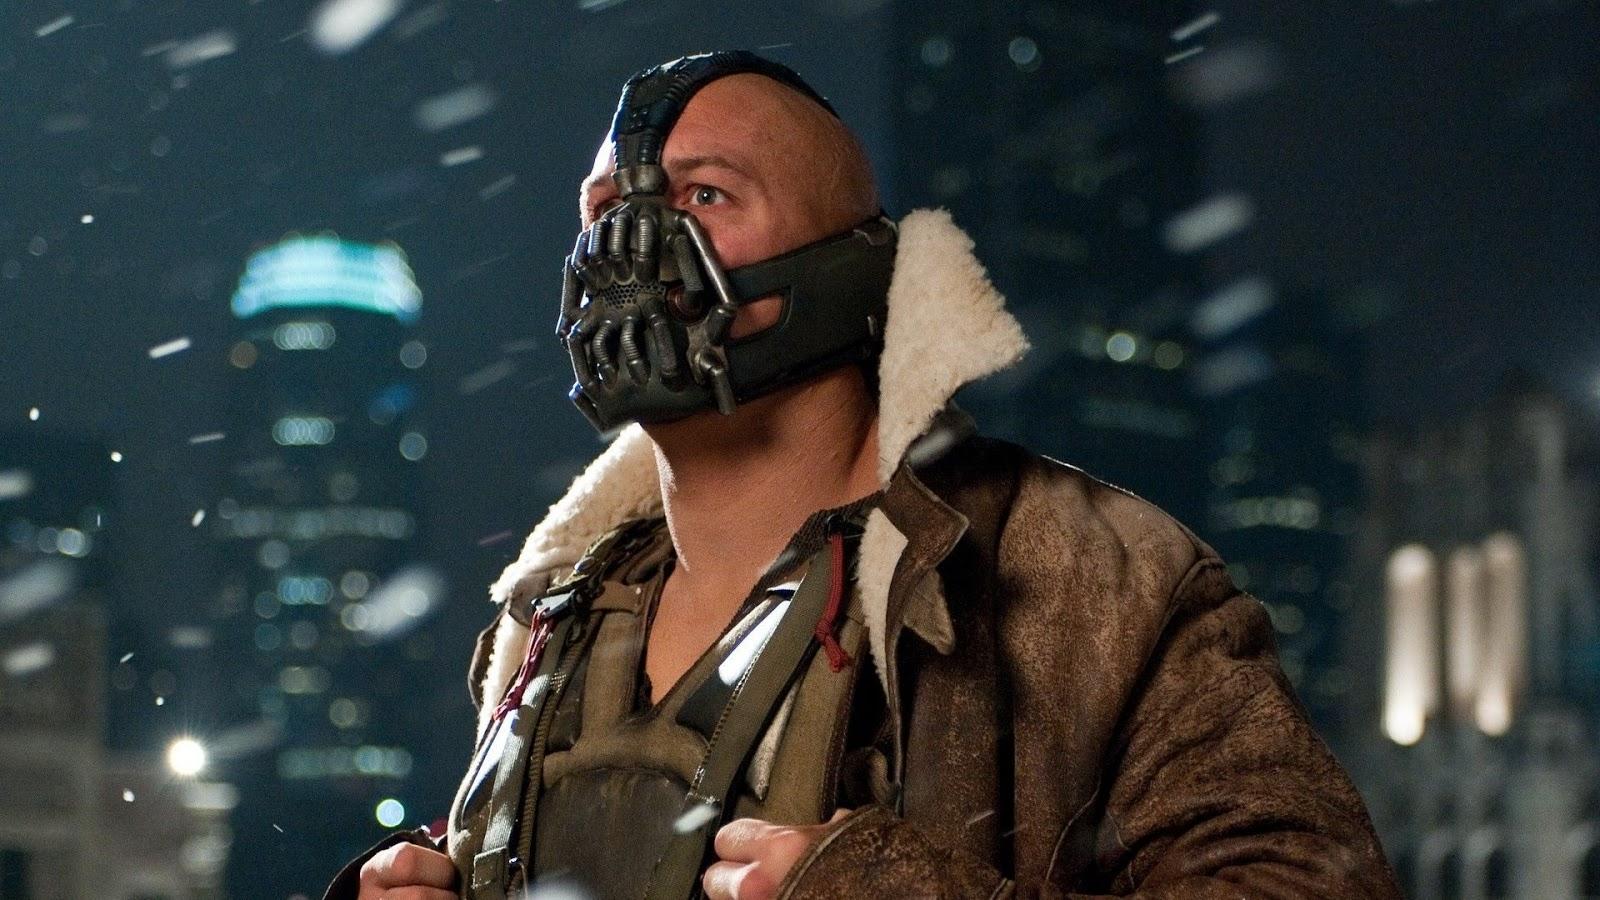 mask in The Dark Knight